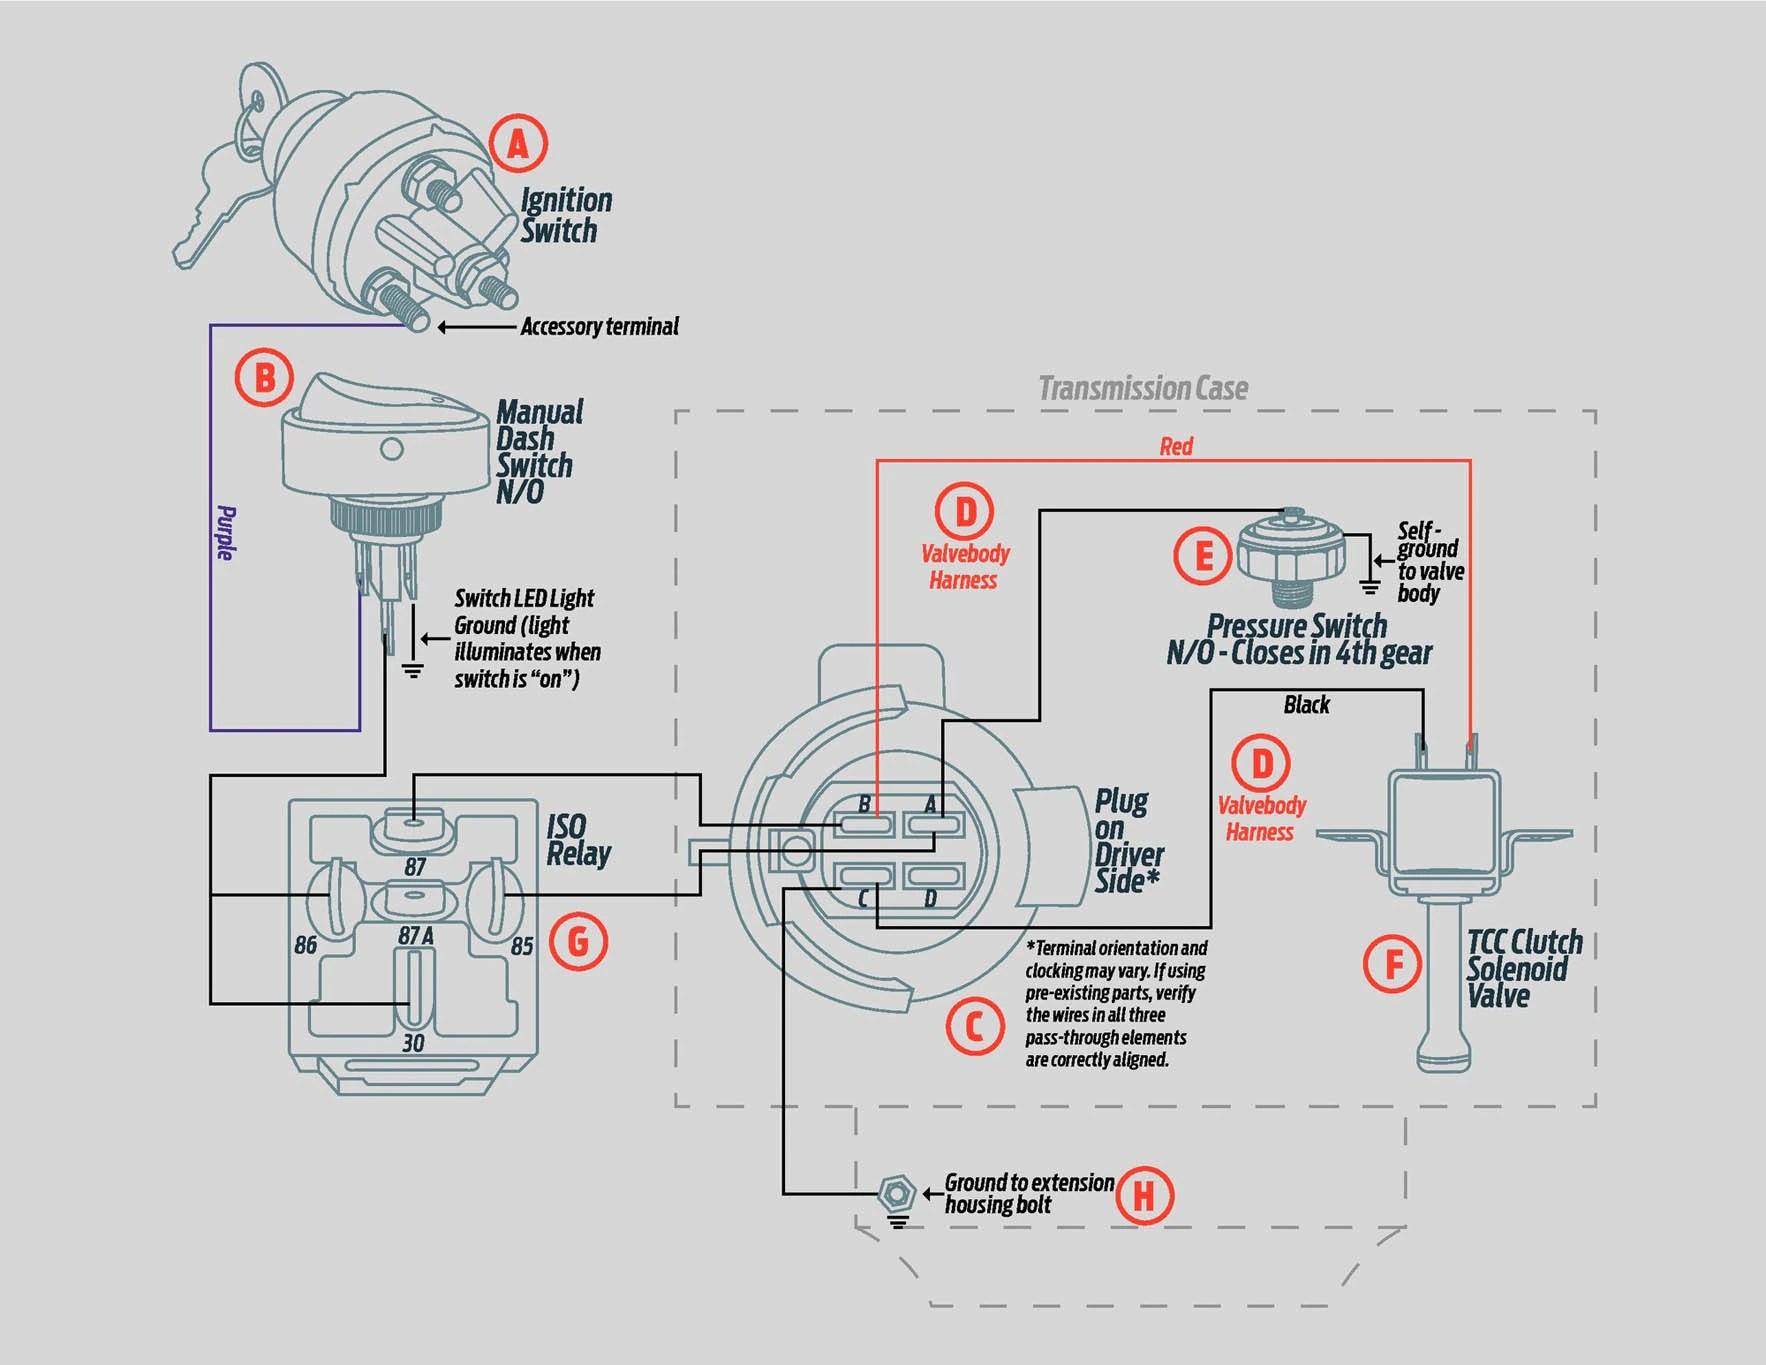 hight resolution of 88 700r4 internal wiring diagram wiring diagrams konsult 4l60e wiring harness diagram besides 200r4 transmission lock up wiring